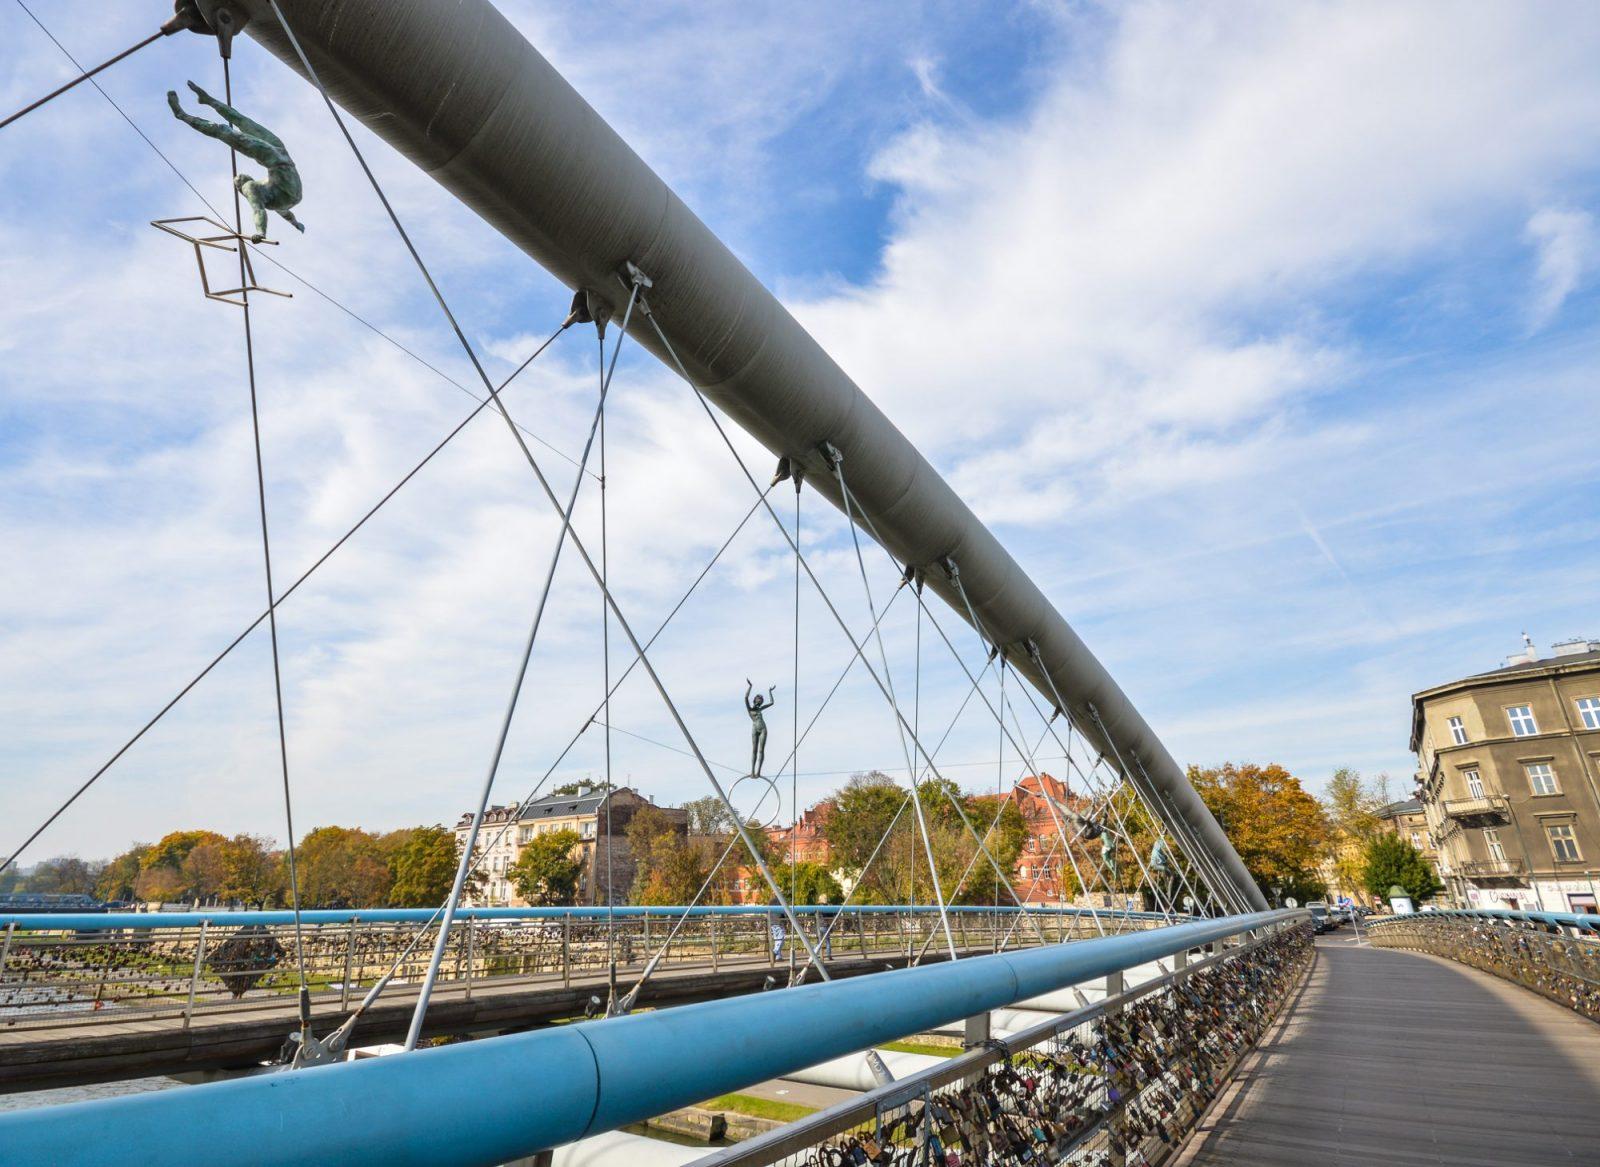 Bernatek Footbridge in Krakow